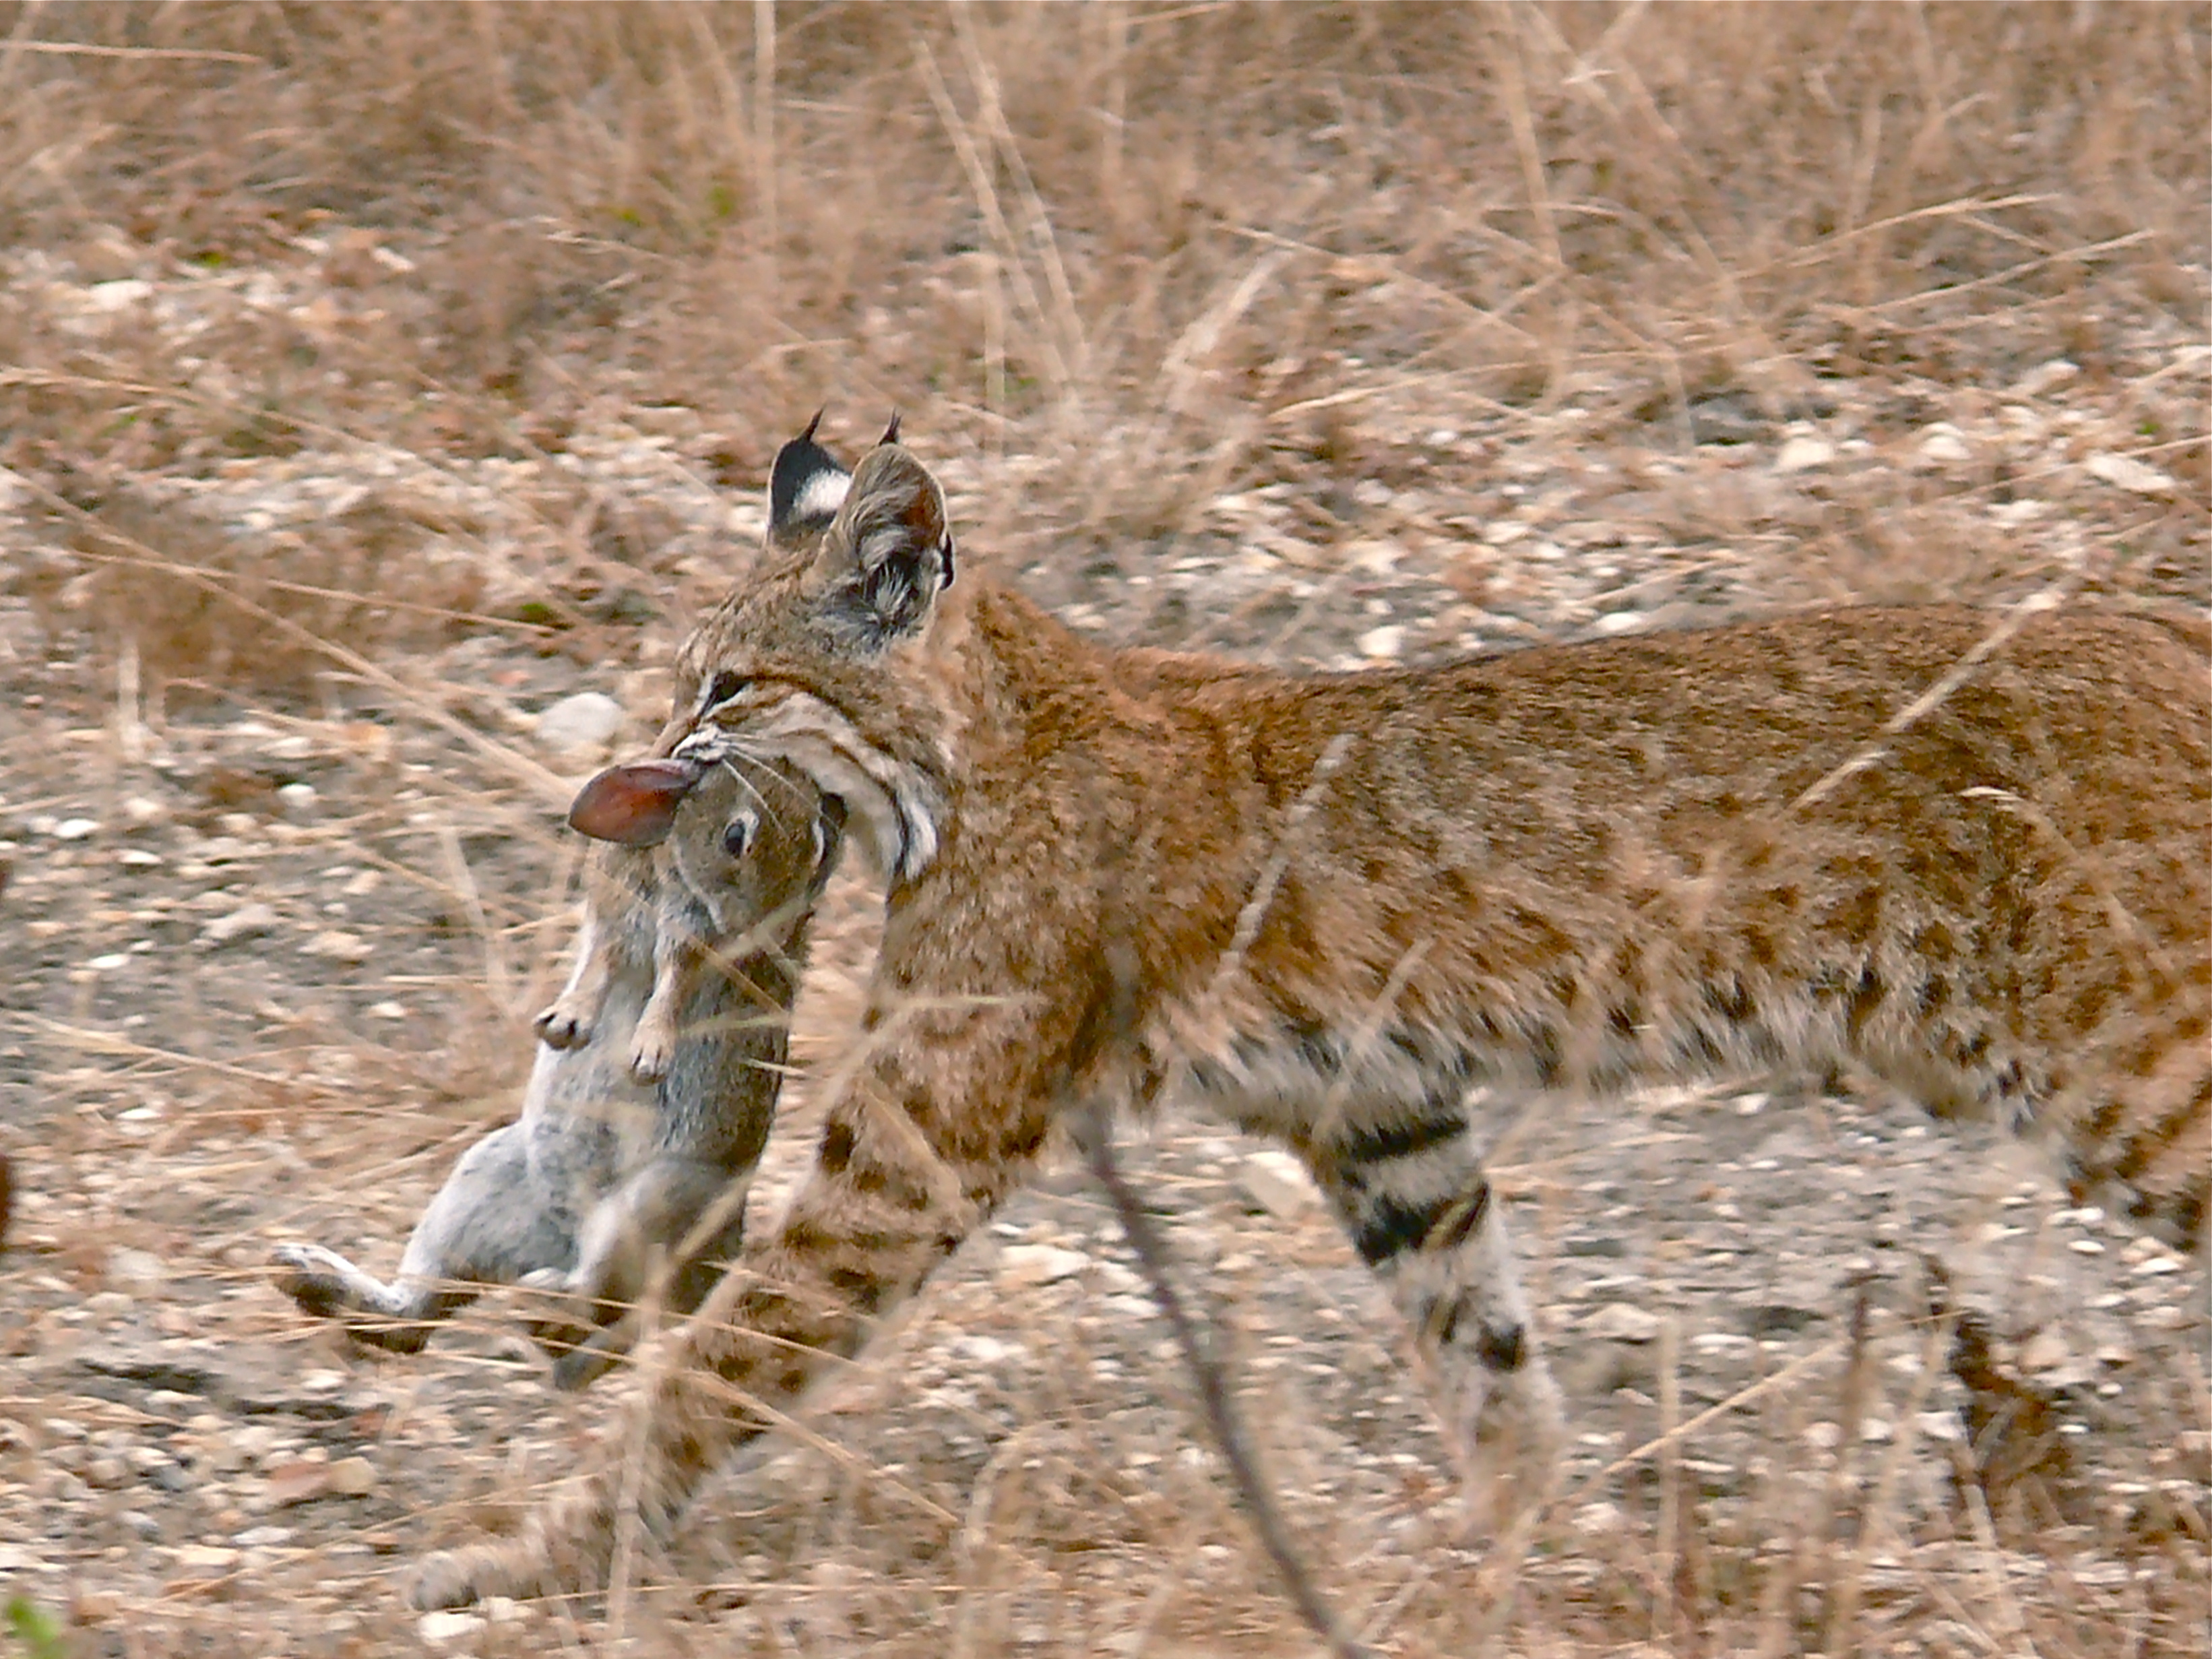 File:Bobcat having caught a rabbit.jpg - Wikimedia Commons